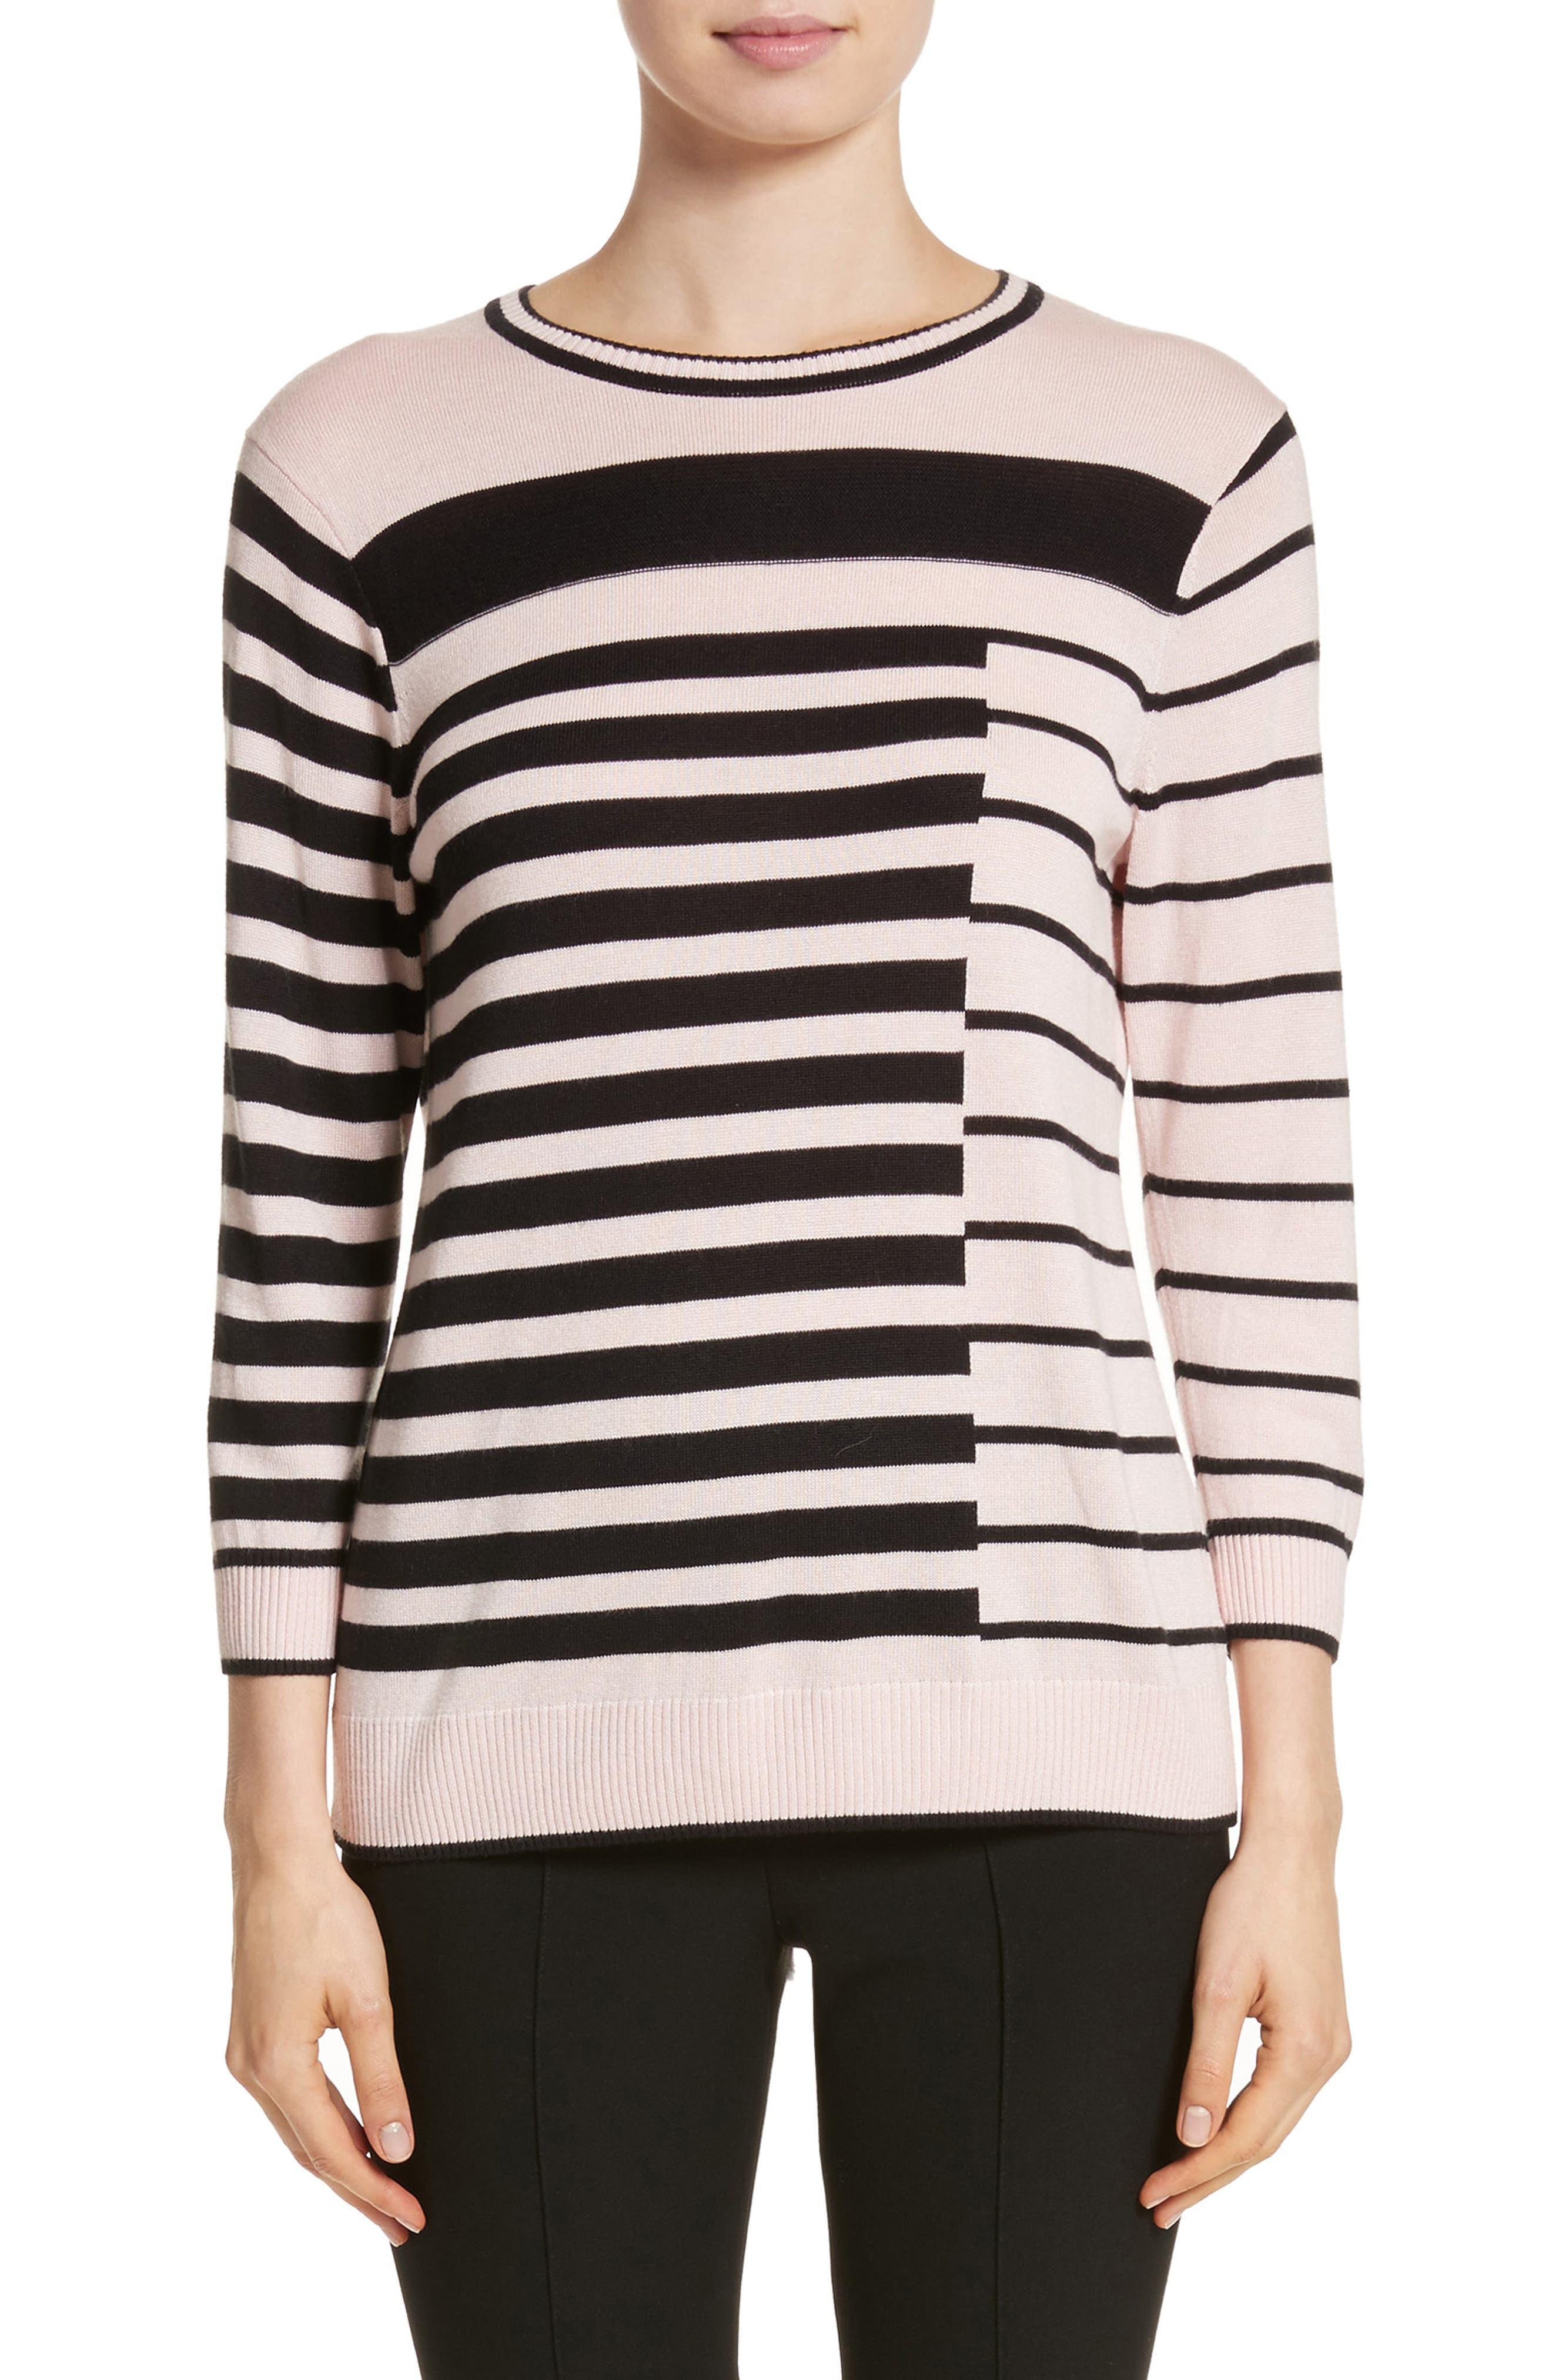 Alternate Image 1 Selected - St. John Collection Intarsia Stripe Sweater